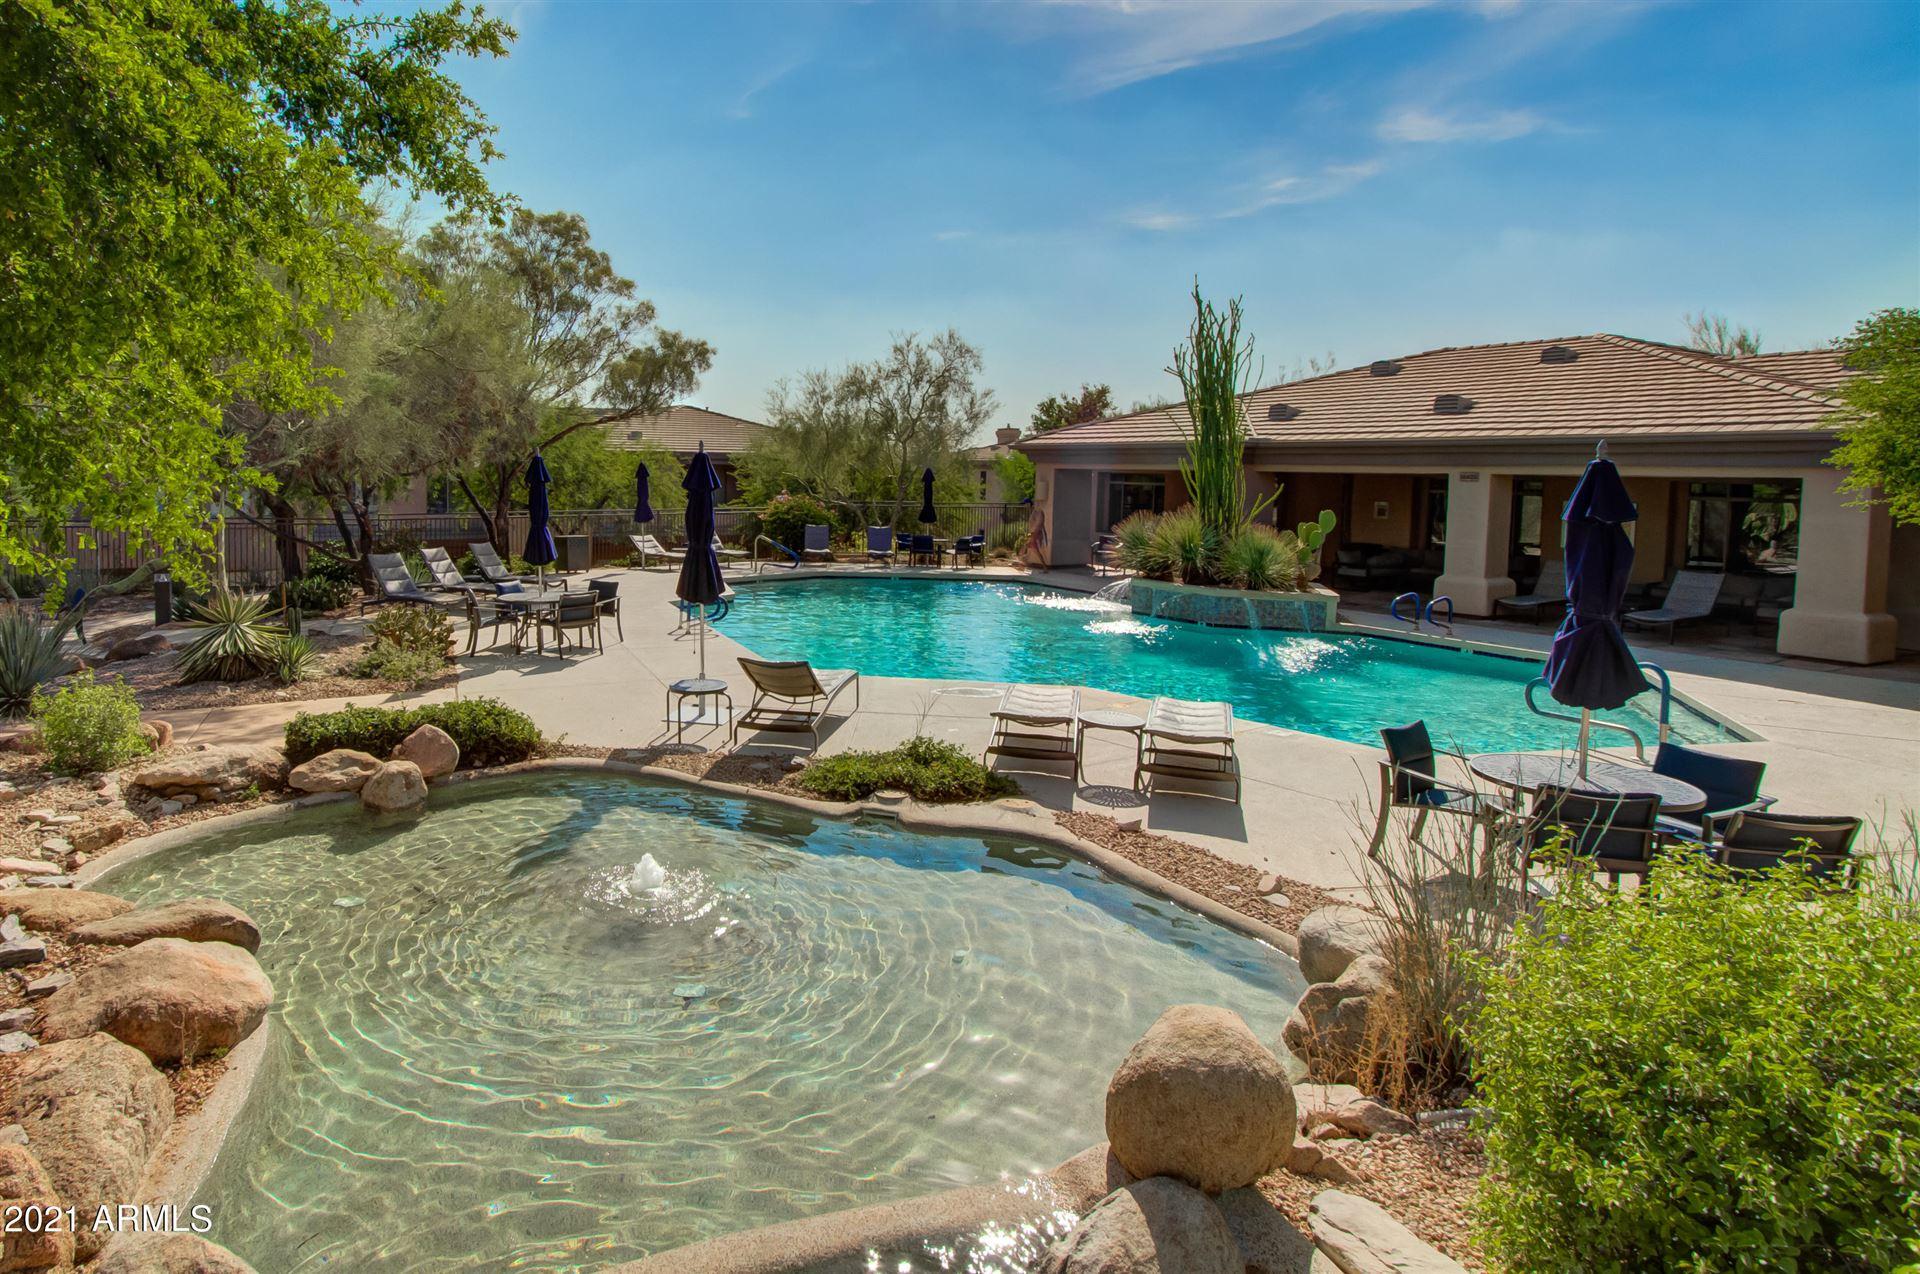 16420 N Thompson Peak Parkway #1043, Scottsdale, AZ 85260 - MLS#: 6274791